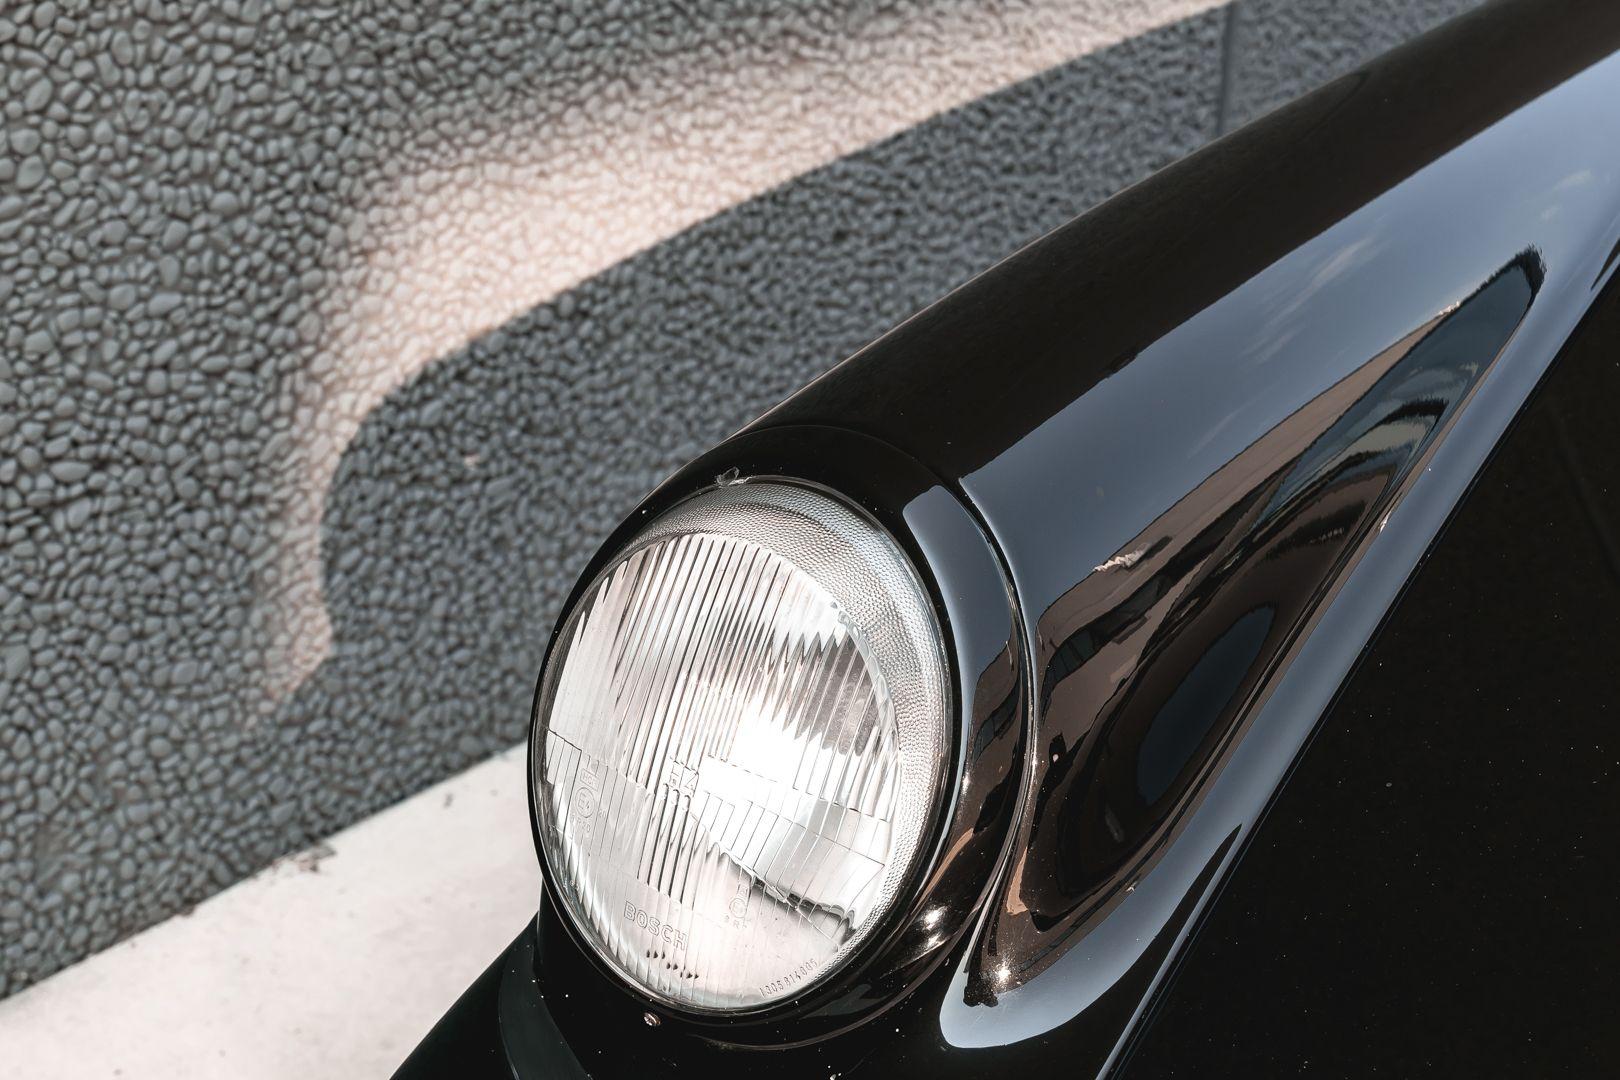 1991 Porsche 911/964 Carrera 4 79189